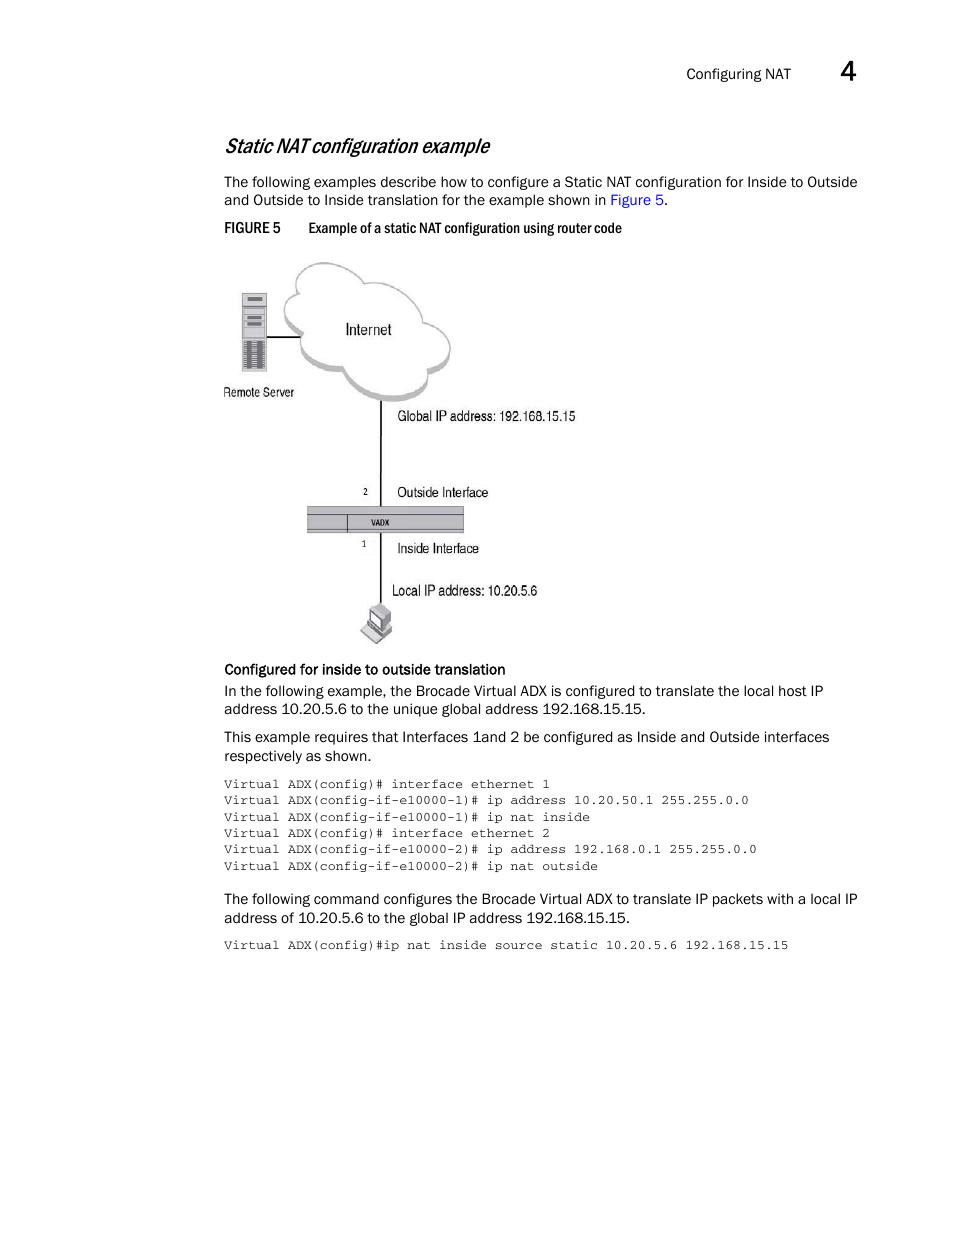 Static nat configuration example | Brocade Virtual ADX